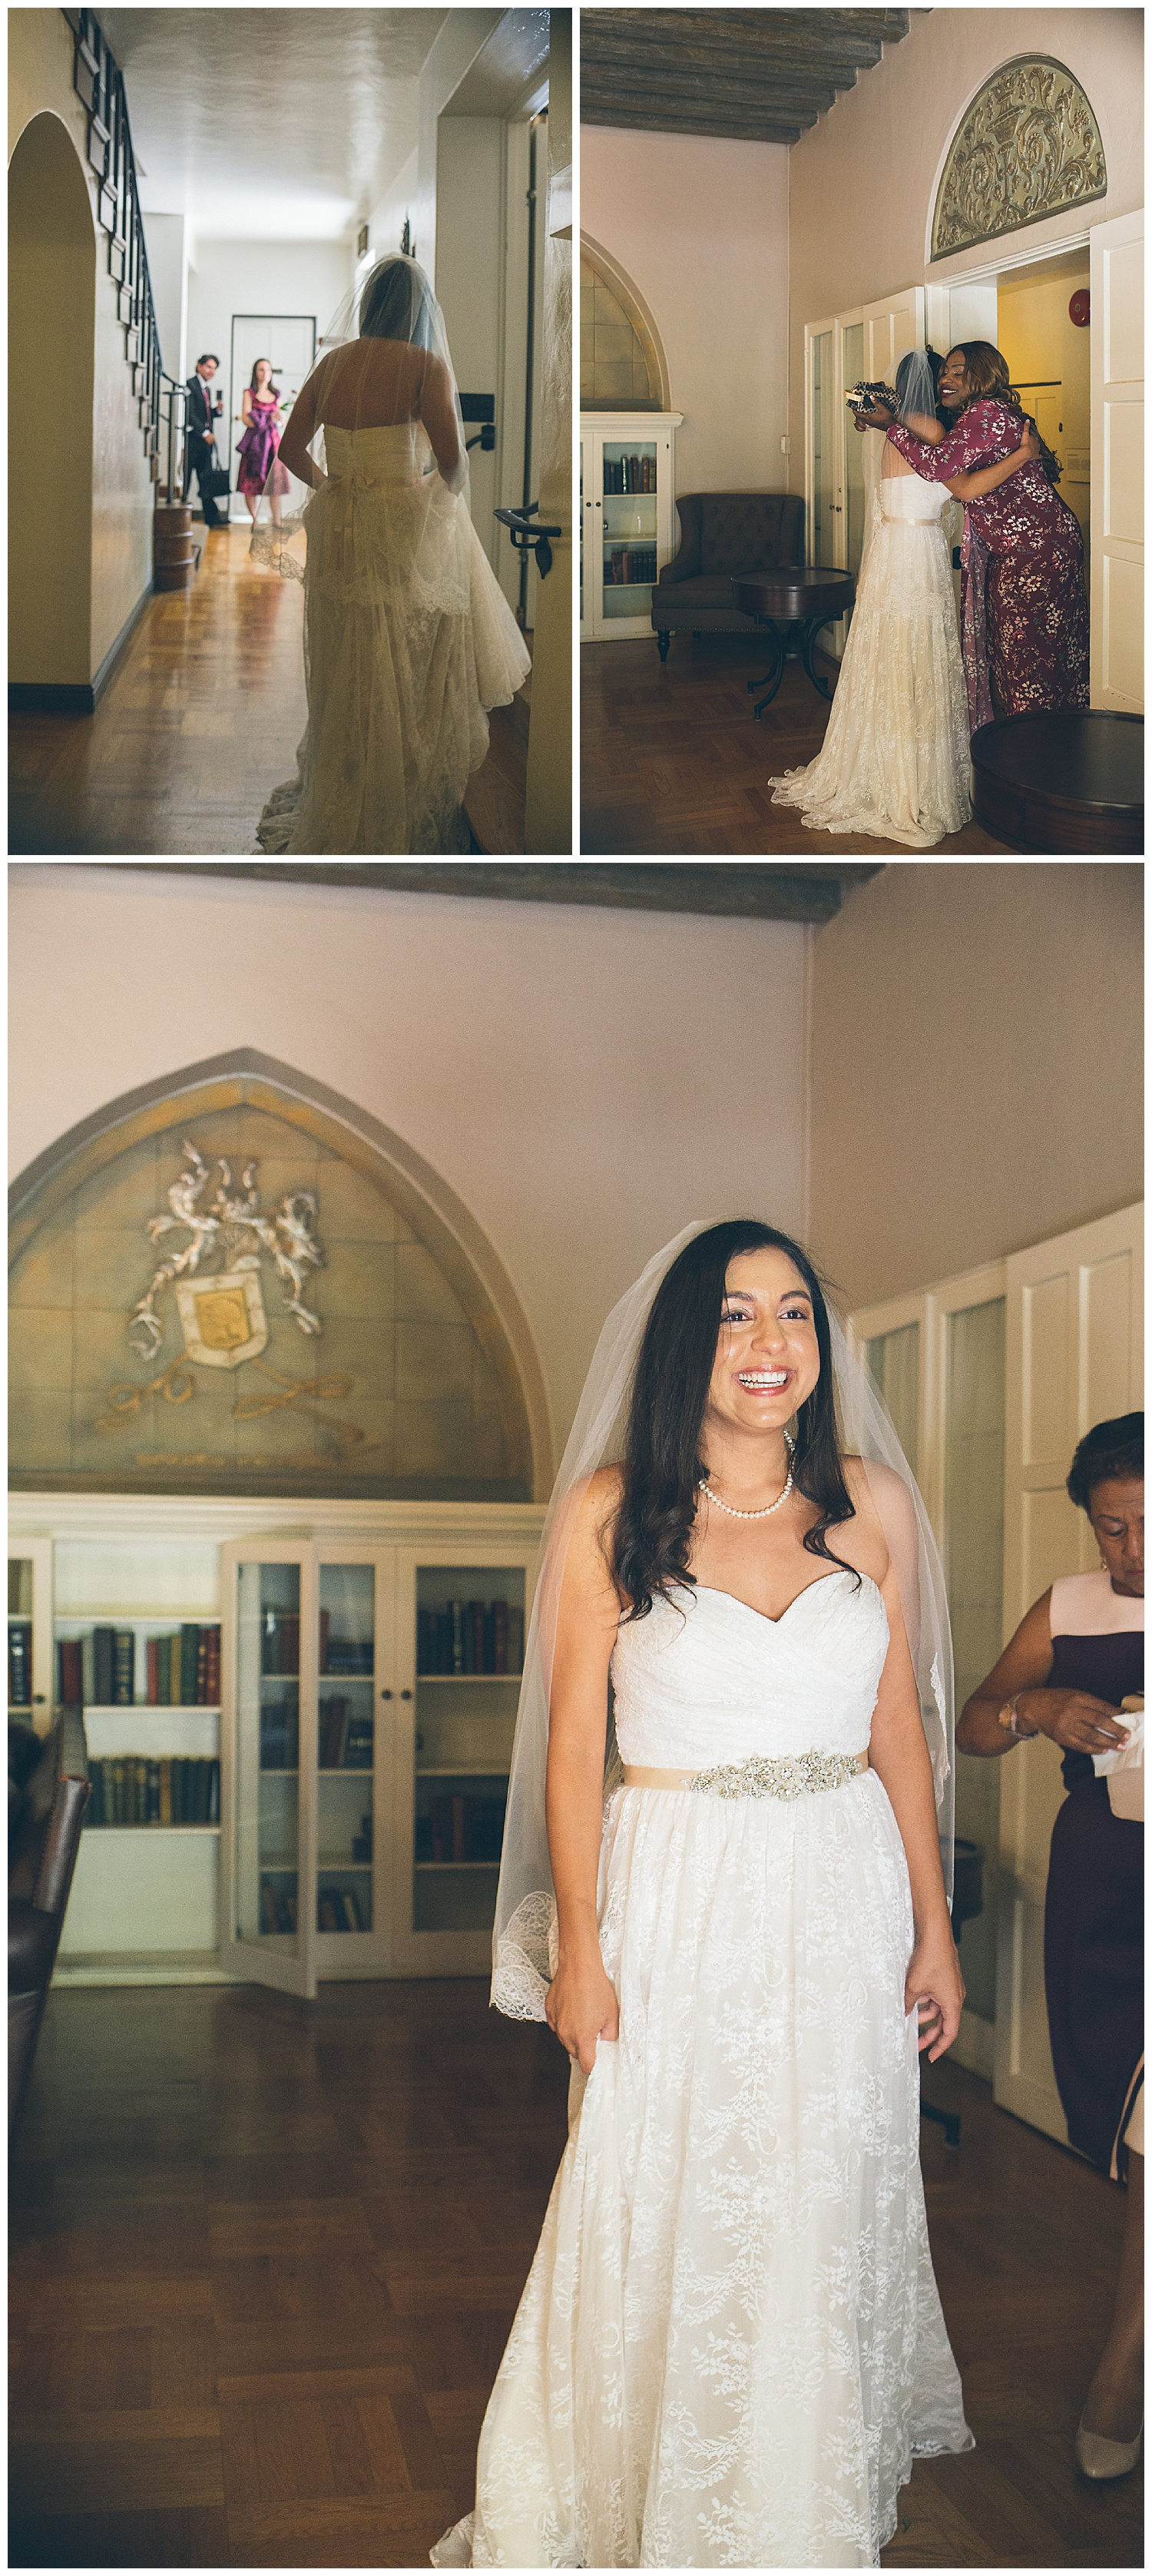 khariza-rae-photography-bay-area-wedding-photographer_0122.jpg